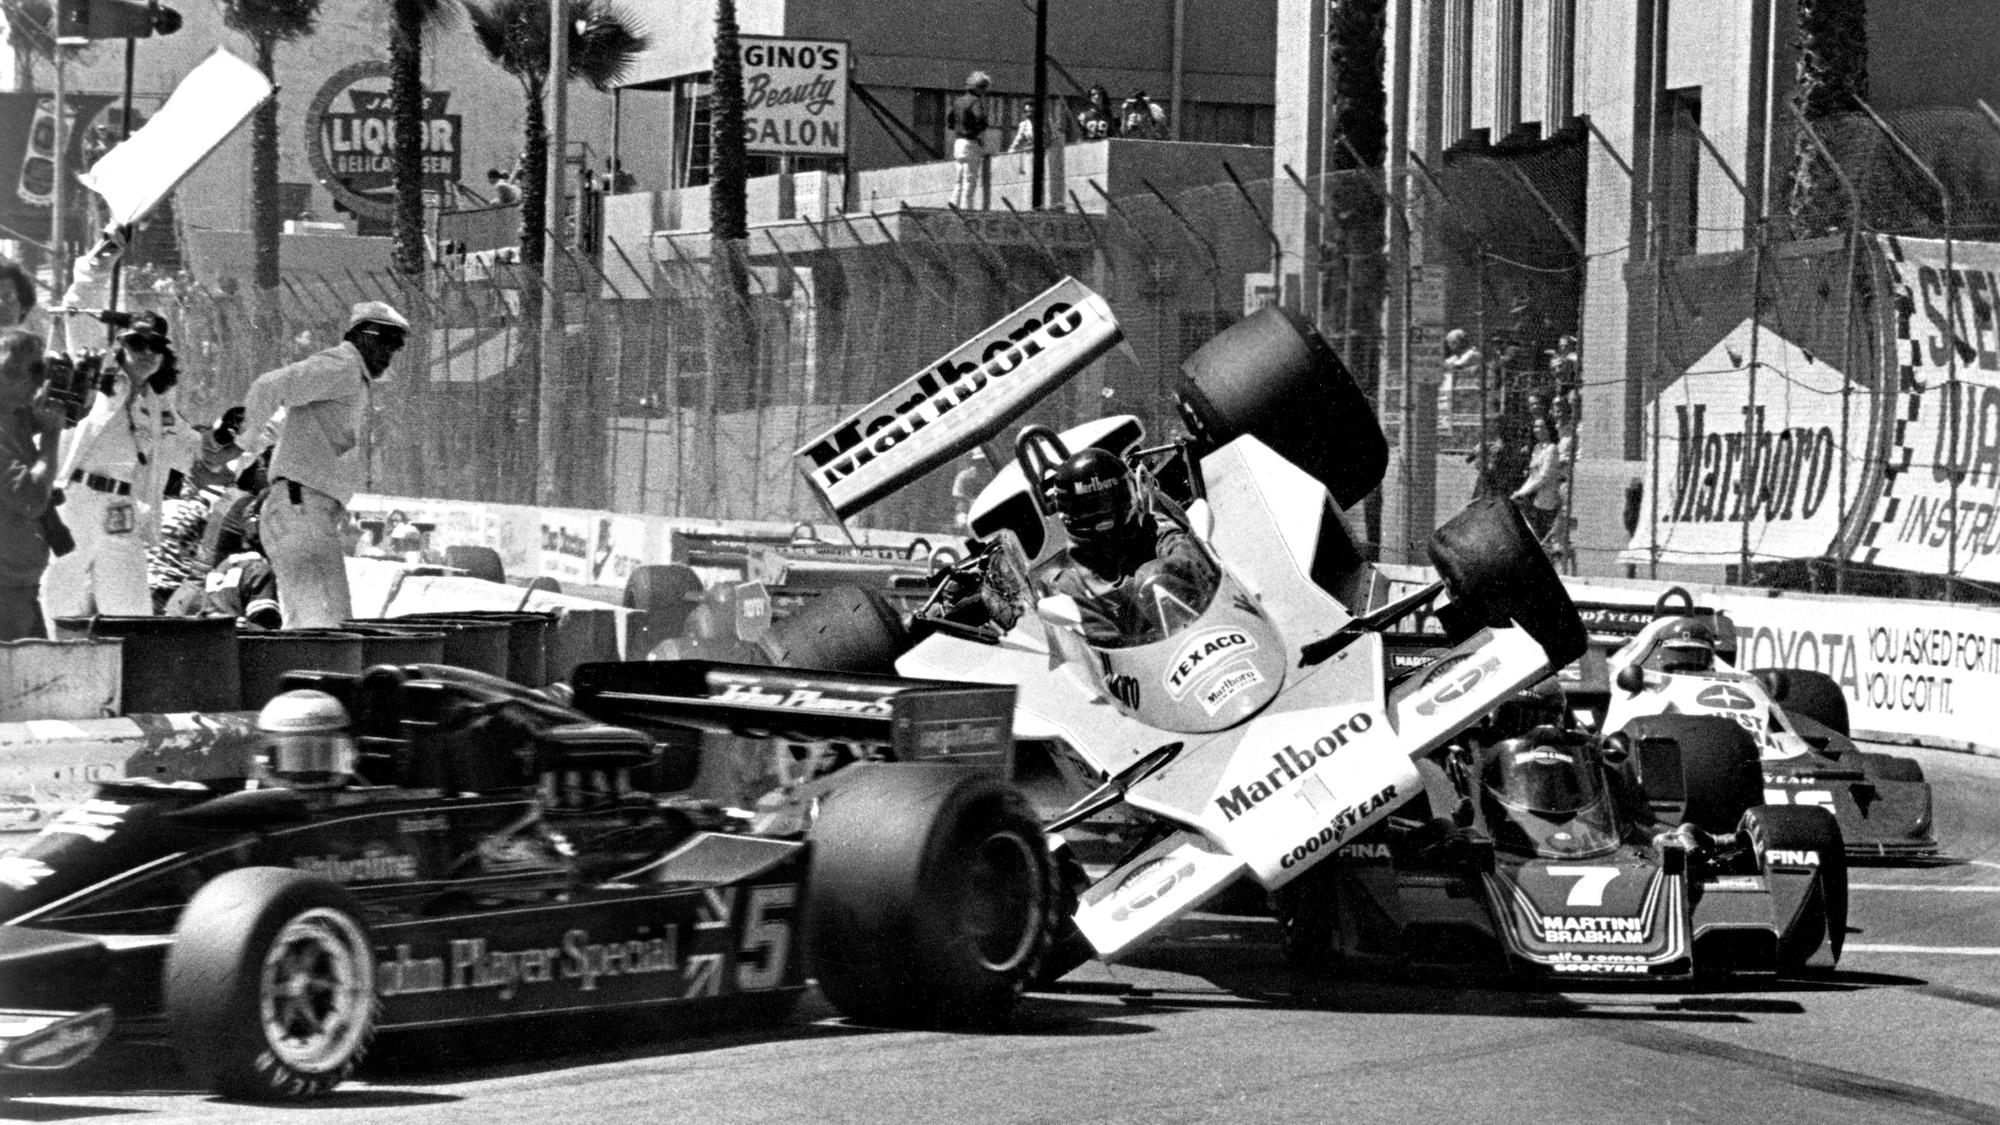 Crash at start of 1977 Long Beach Grand Prix